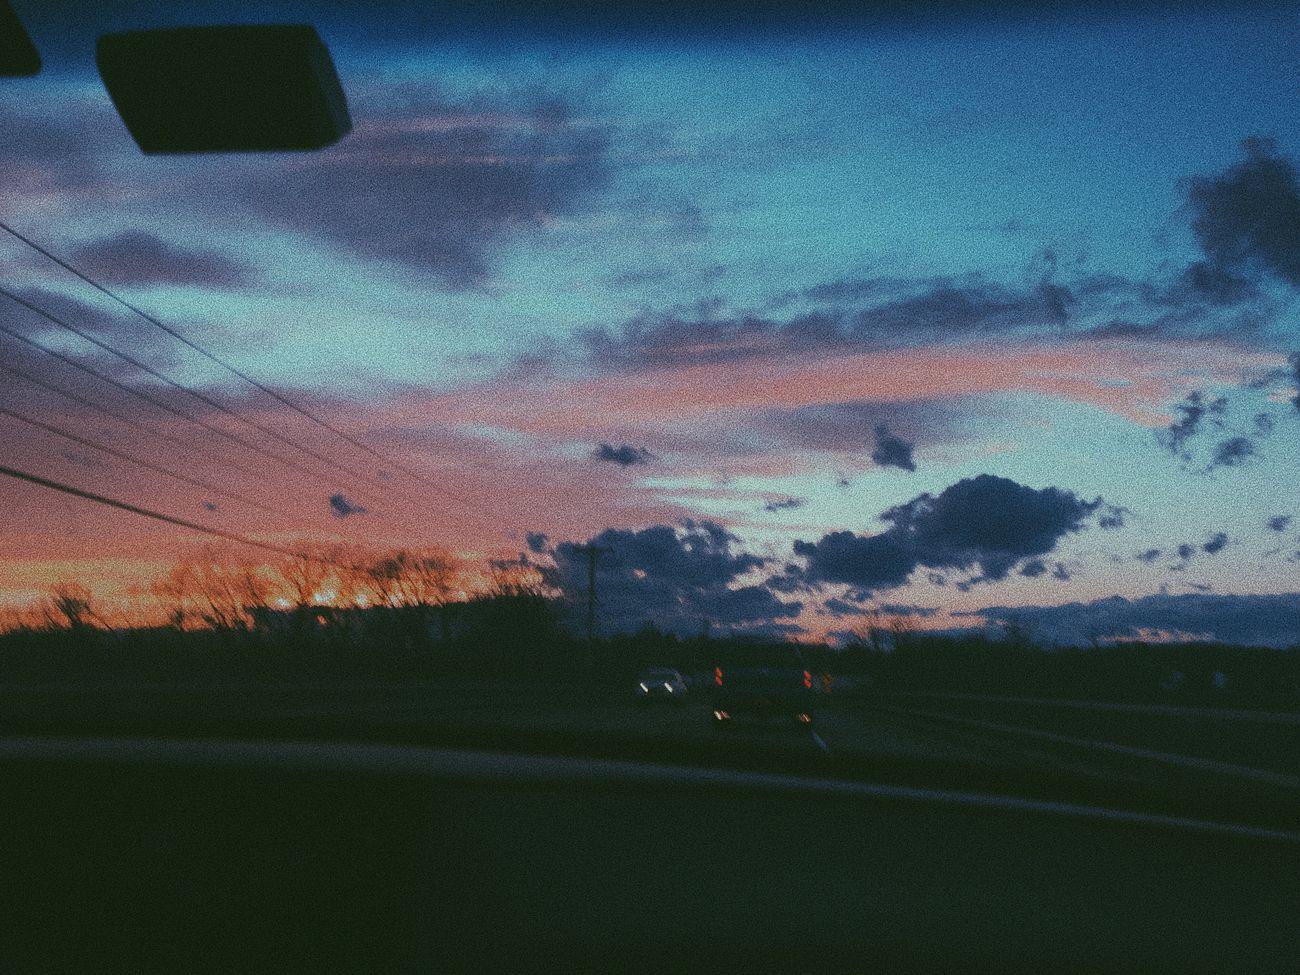 Sunset CarRides Cloud - Sky Tranquility Scenics Sky Dusk First Eyeem Photo